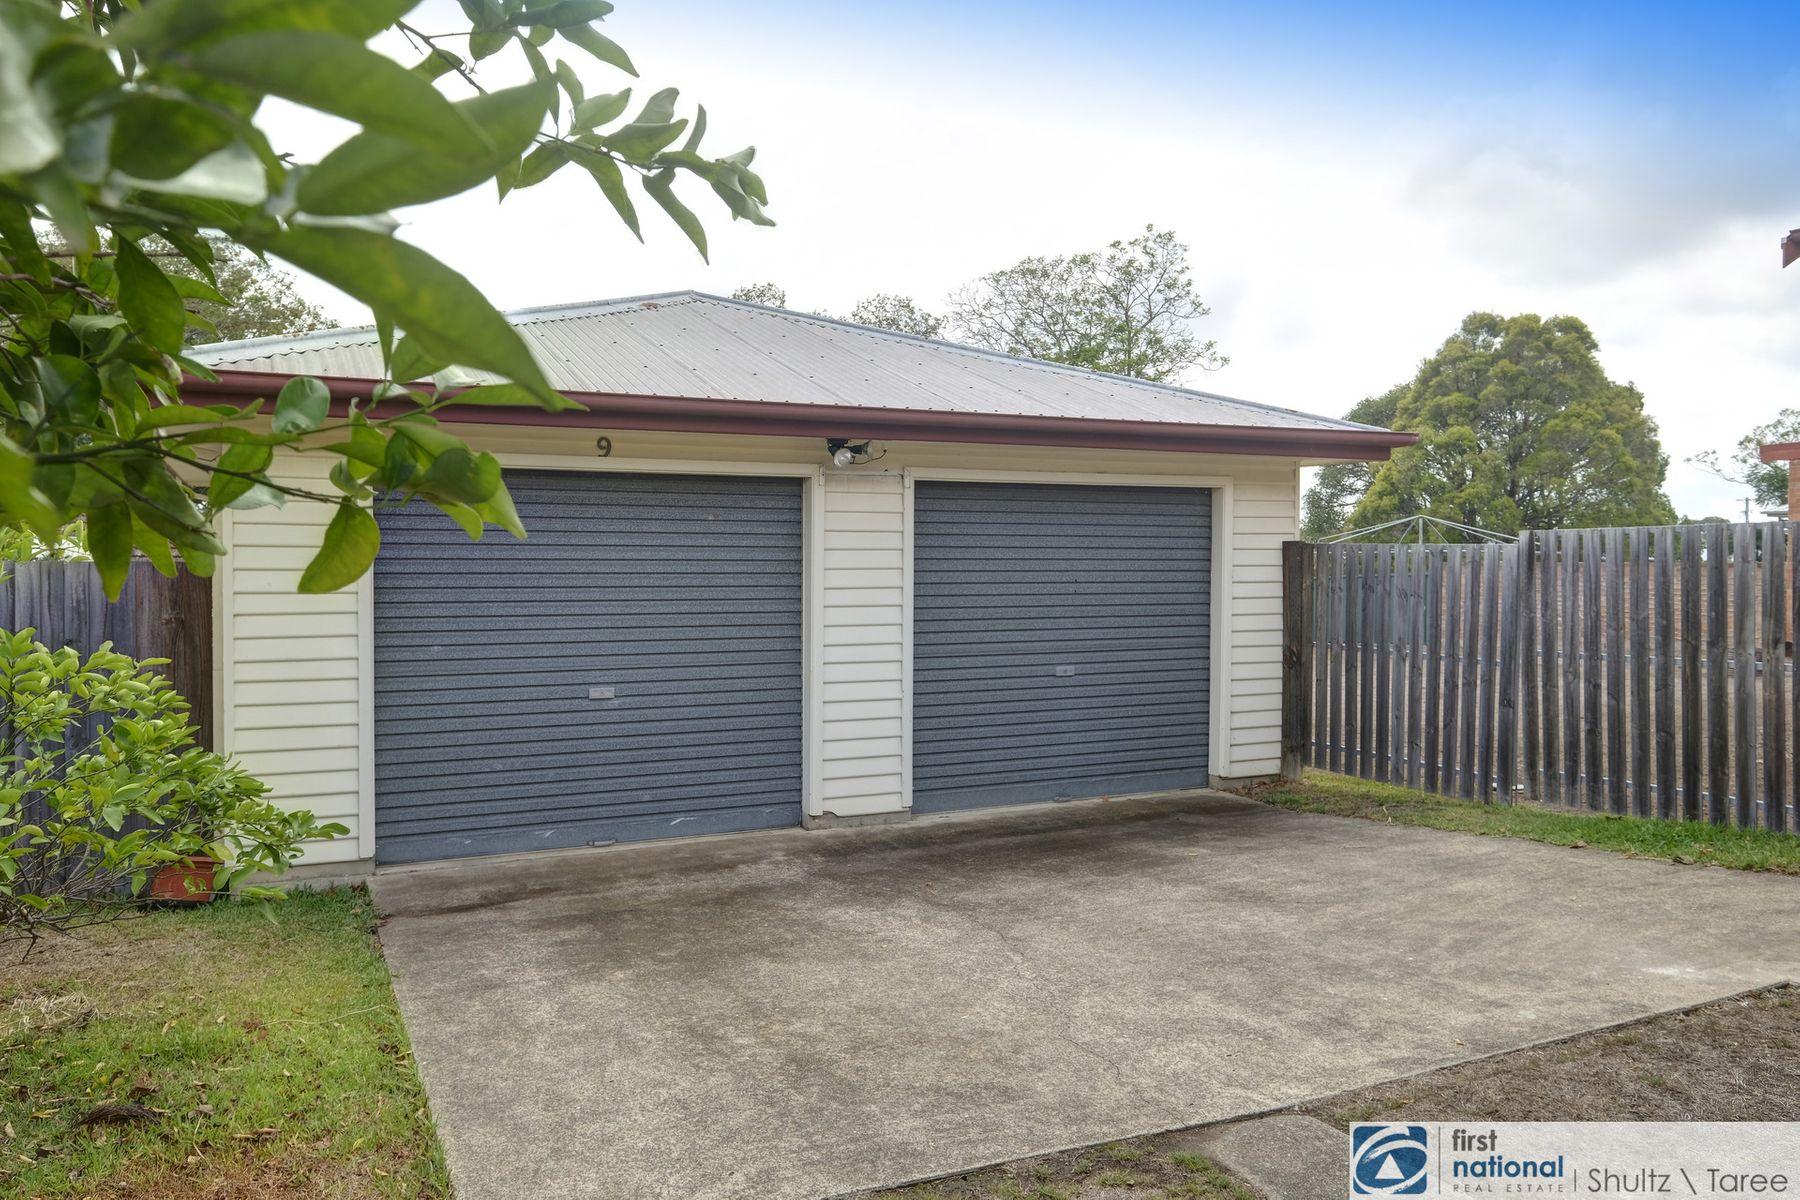 9 Smith Street, Taree, NSW 2430